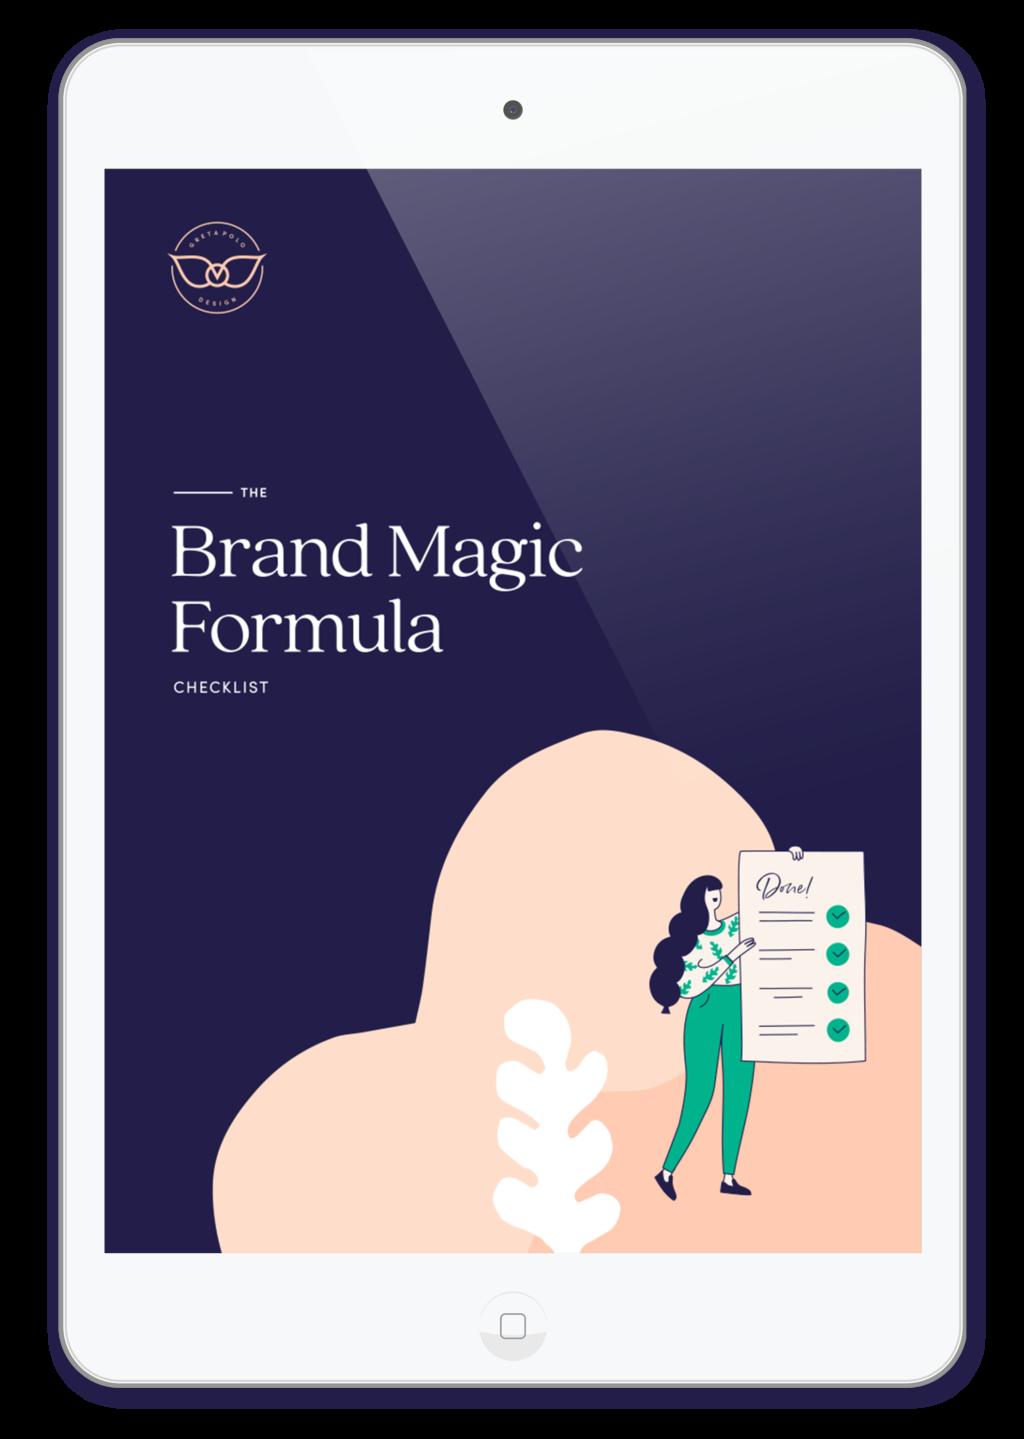 Brand Magic Formula Checklist lead magnet ipad image